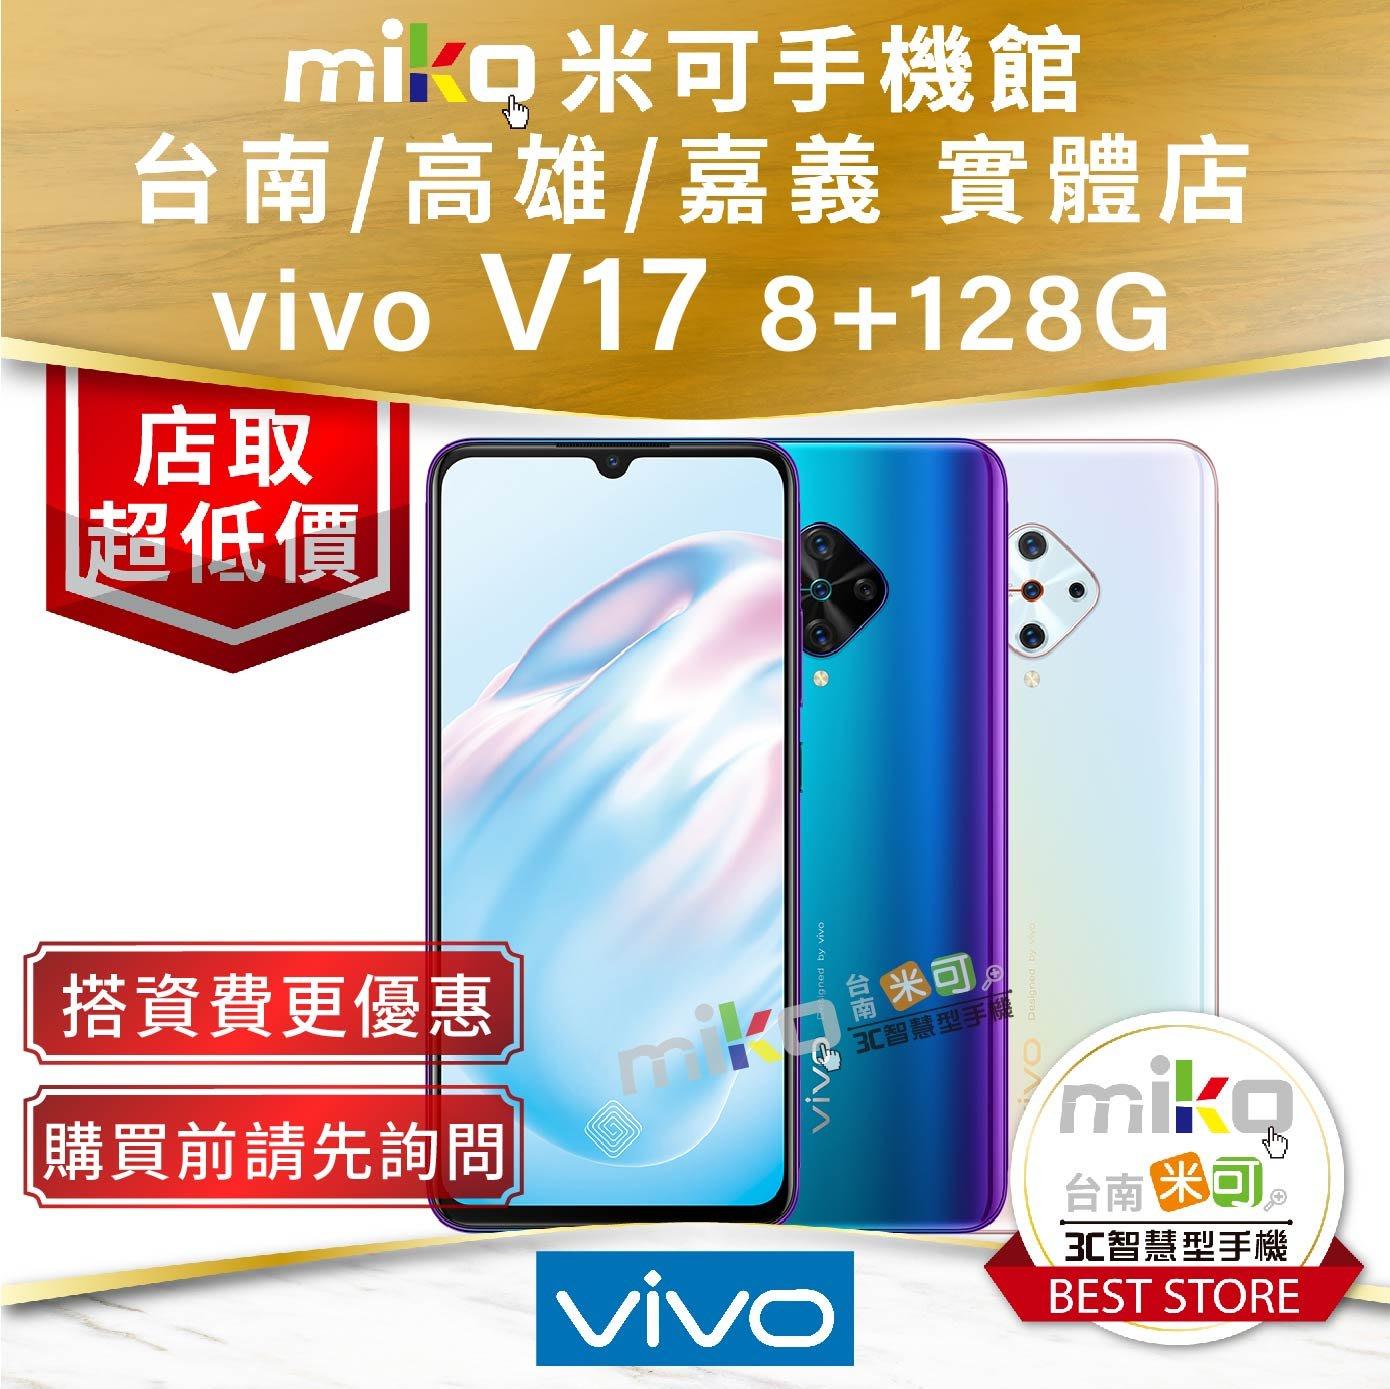 VIVO V17 8+128G 6.38吋 AI四鏡頭 空機價$7590 搭資費更優惠【台南高雄嘉義MIKO米可手機館】